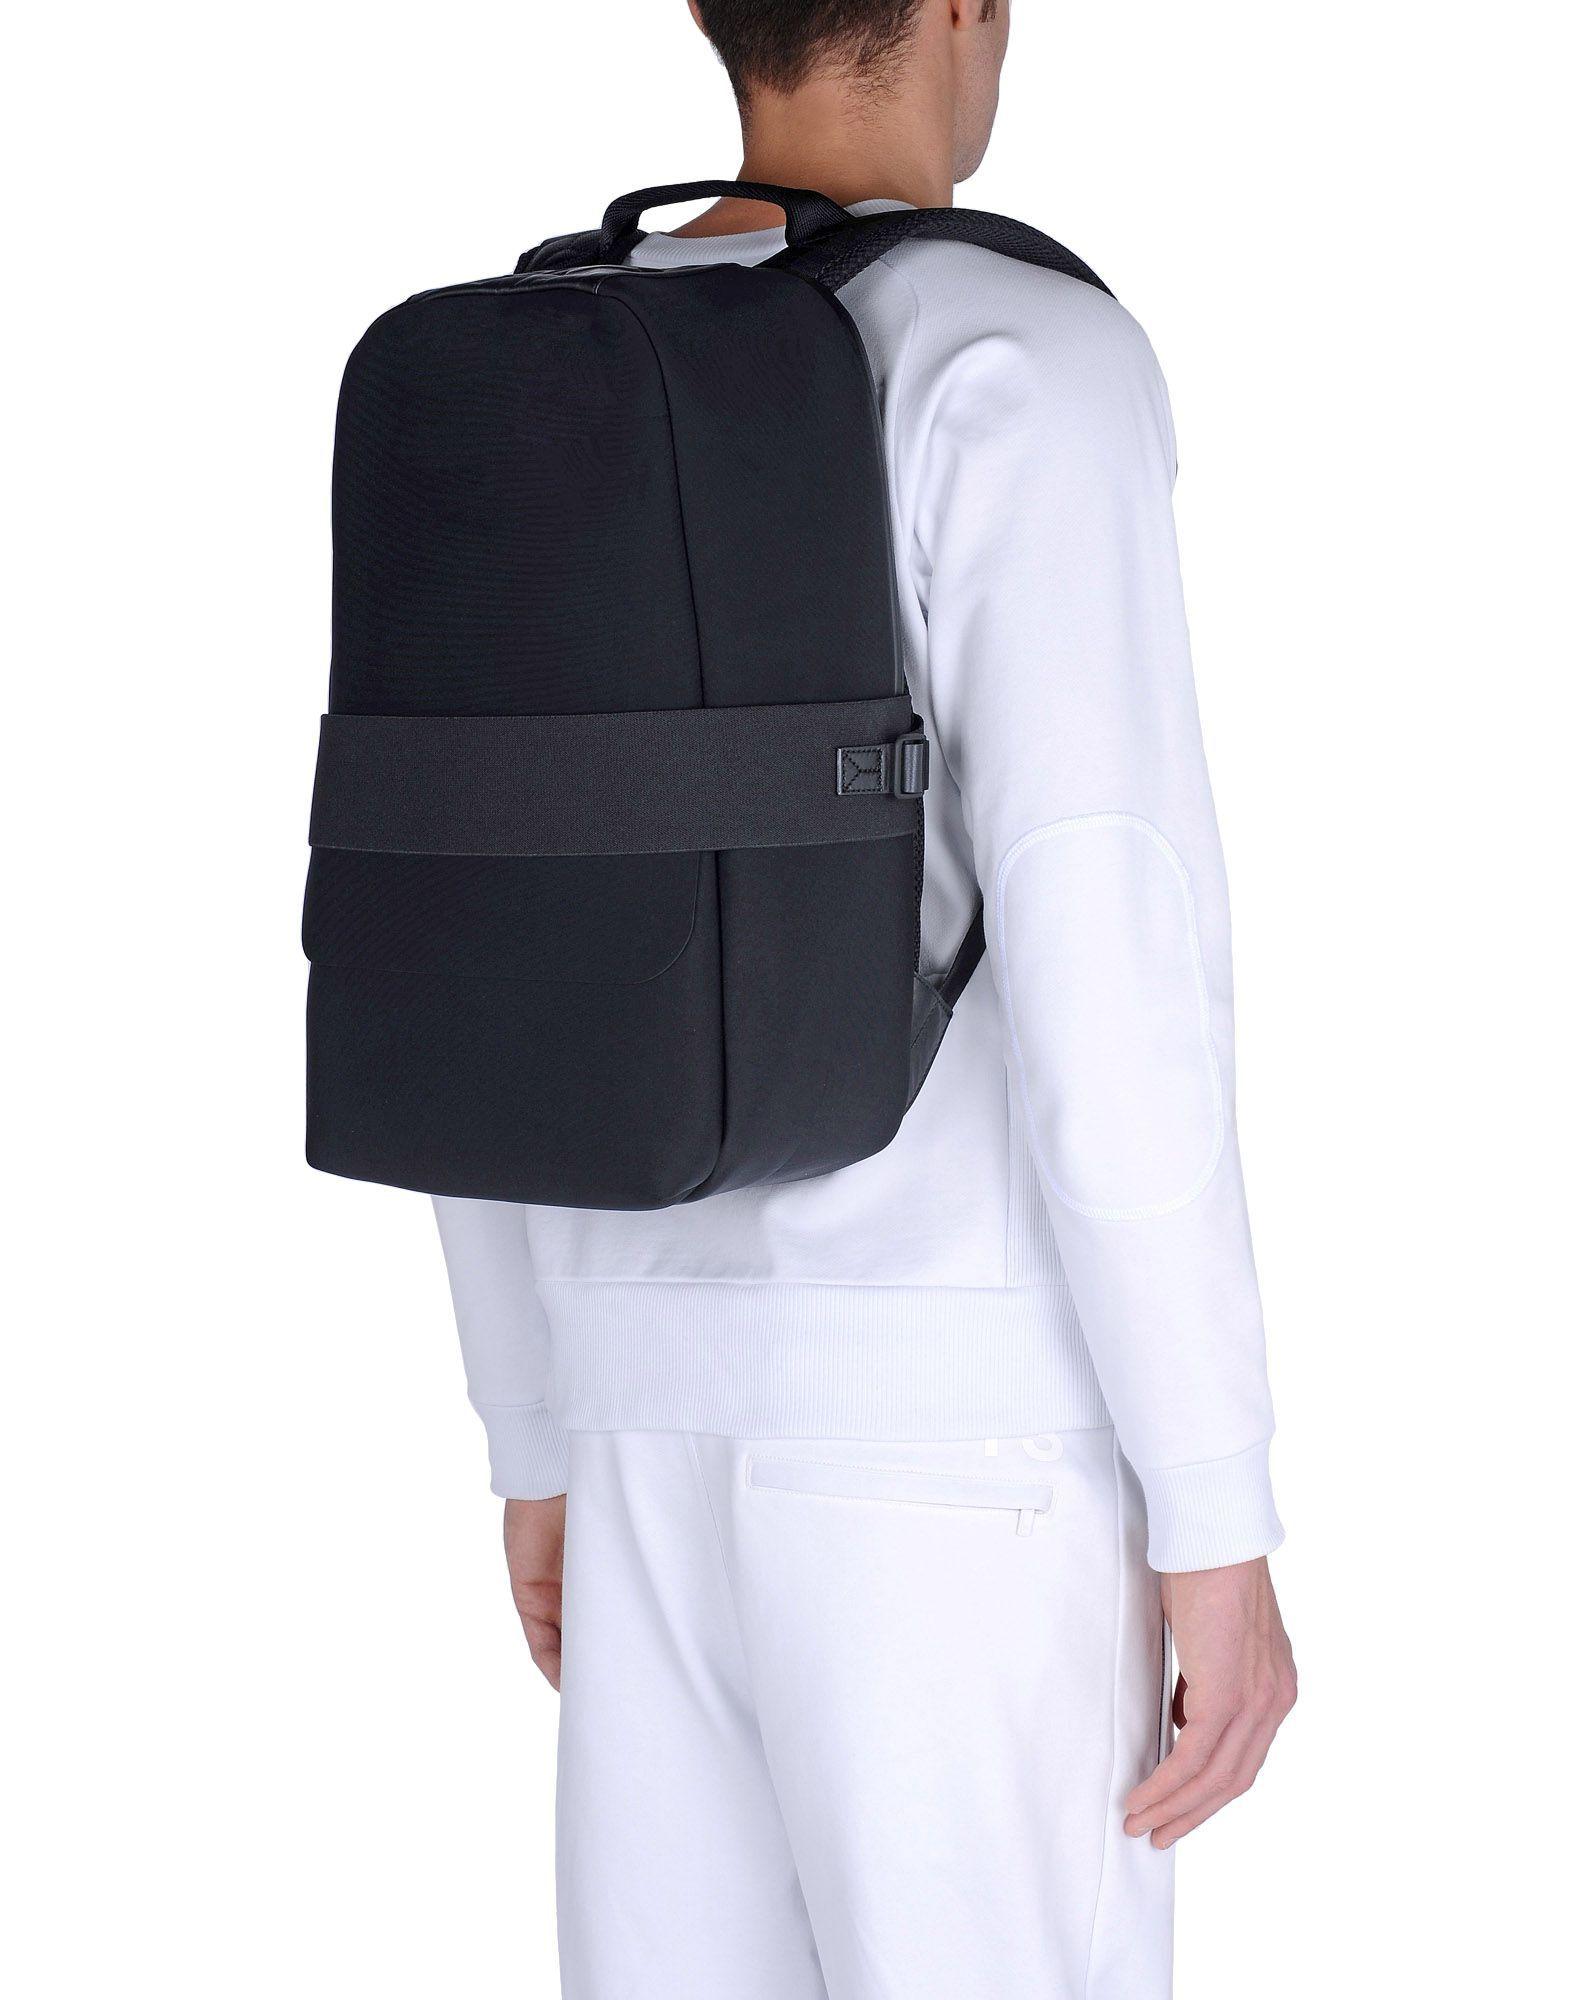 ... Bags Backpacks,adidas y3 high tops,Y  Y-3 QASA BACKPACK バッグ unisex Y-3  adidas sale retailer b7ba2 79795 ... 4a5eaf2922